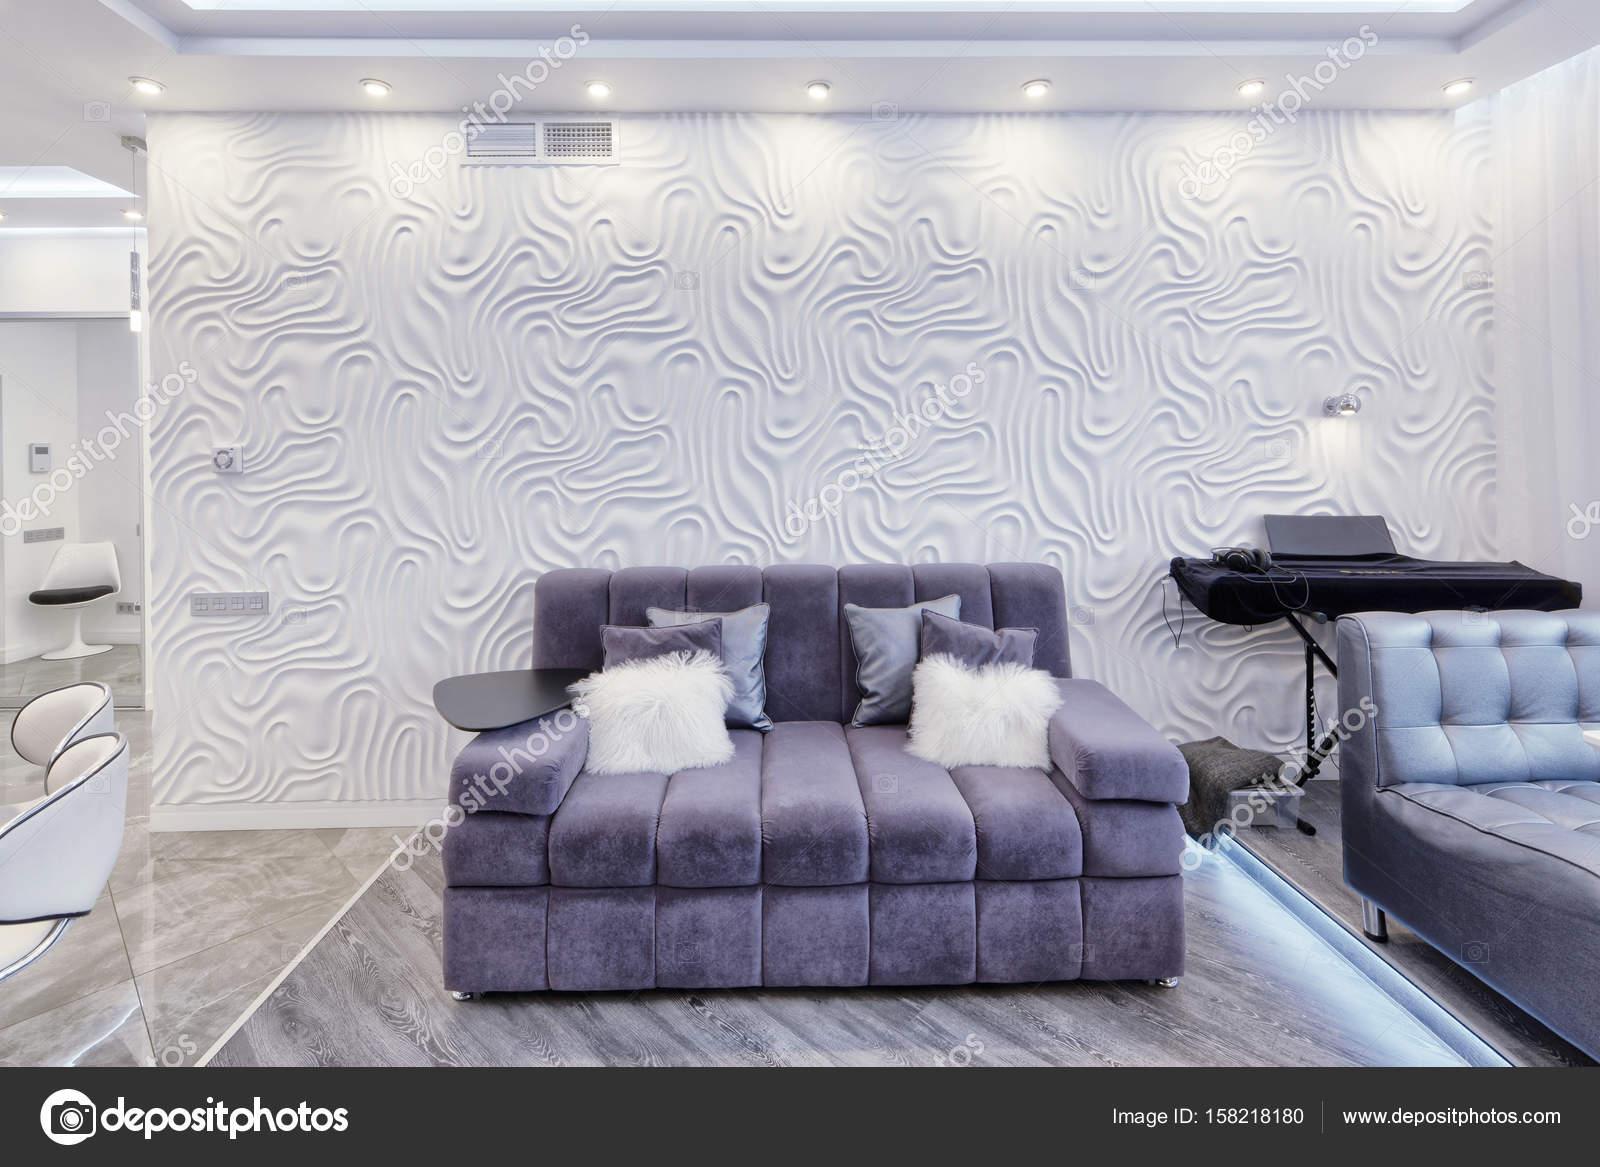 https://st3.depositphotos.com/4730441/15821/i/1600/depositphotos_158218180-stockafbeelding-moderne-design-interieur-van-woonkamer.jpg